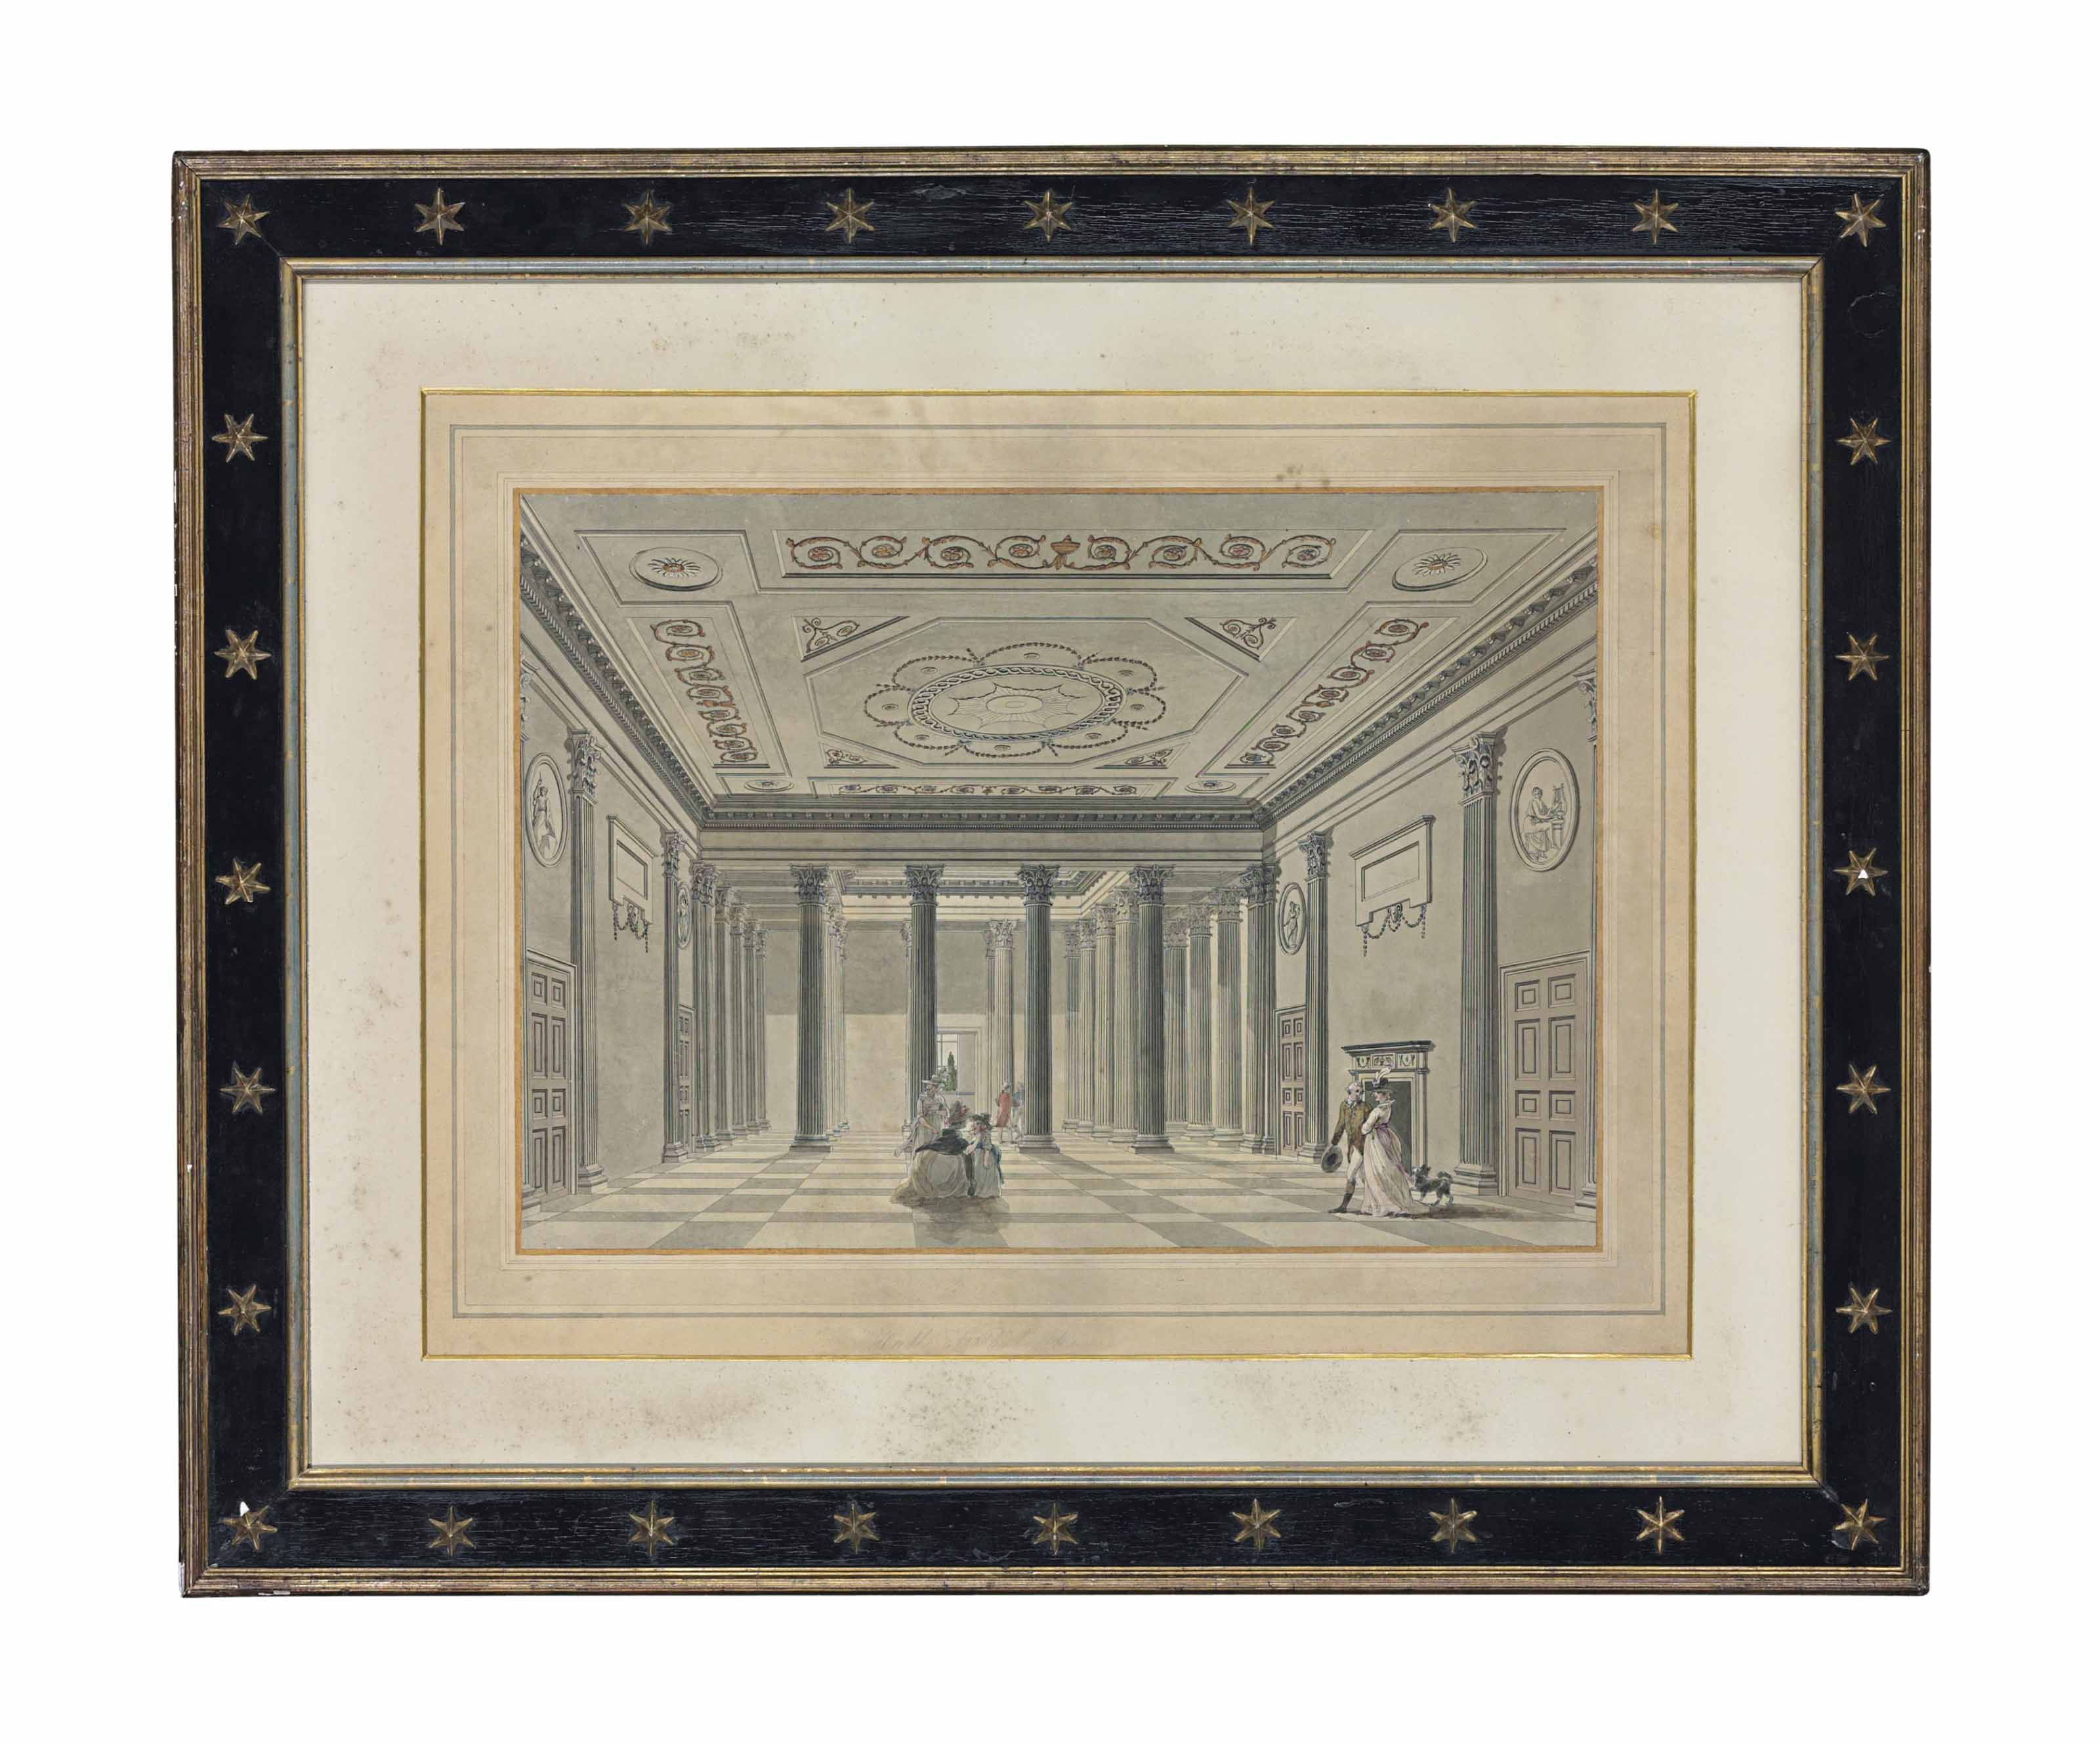 AFTER THOMAS MALTON (London 1748-1804)